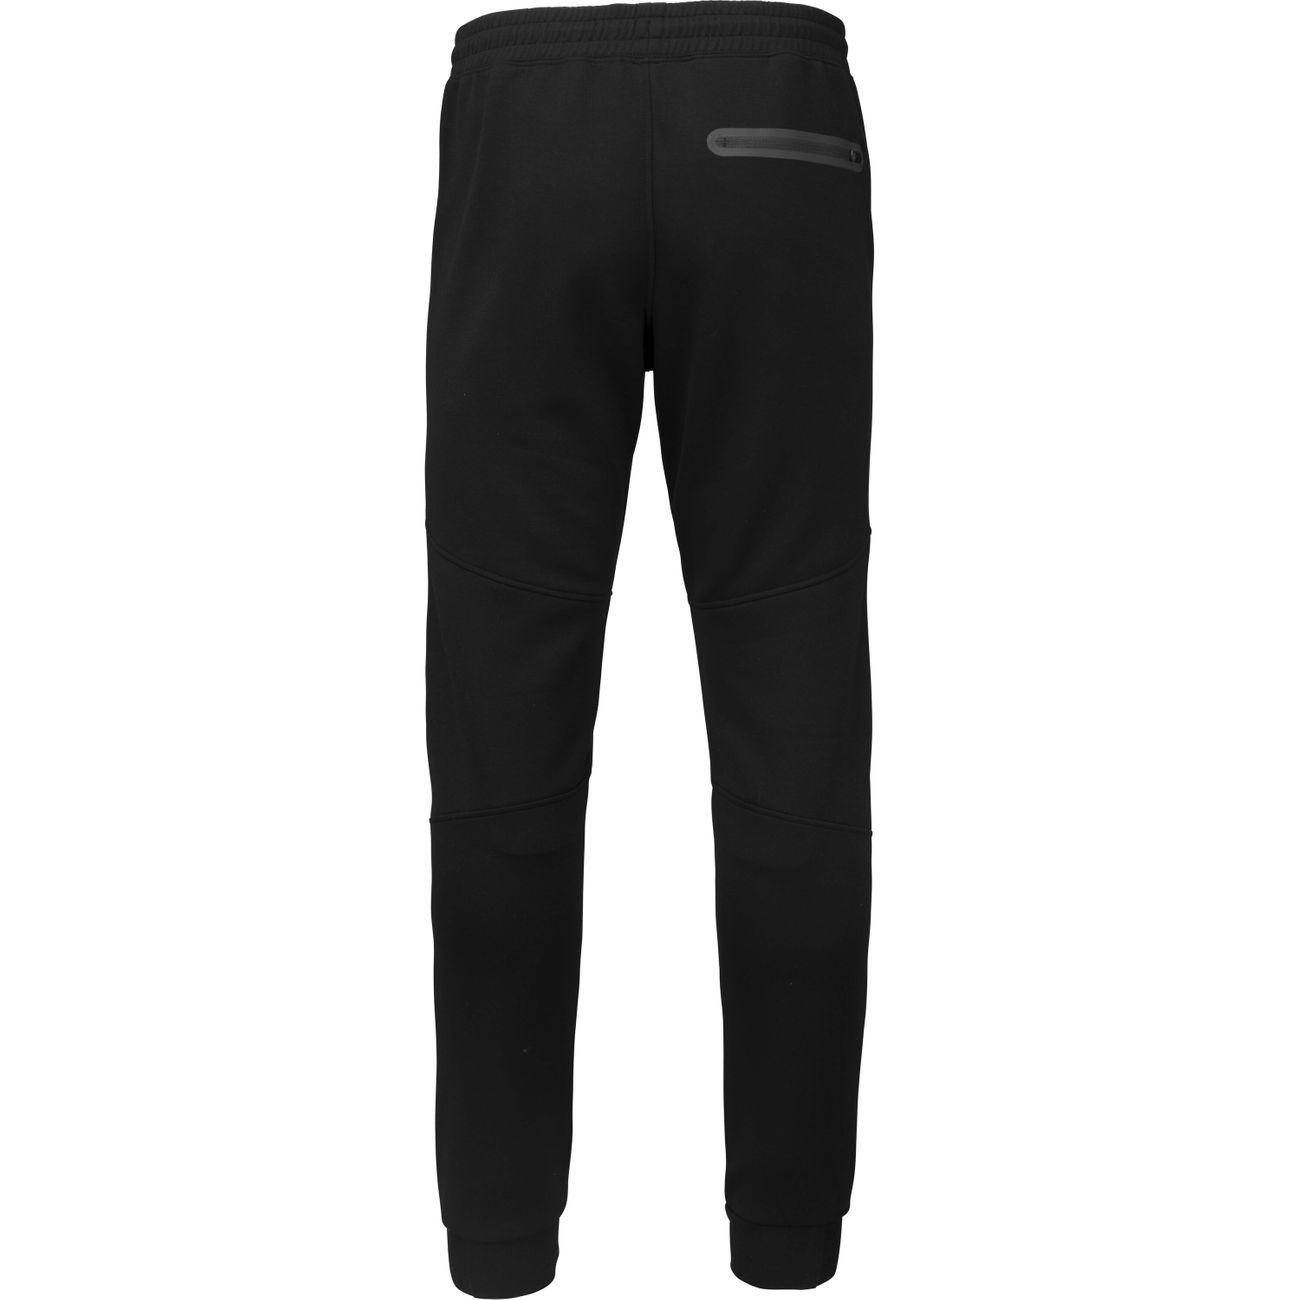 Fitness homme PROACT Pantalon de jogging Proact